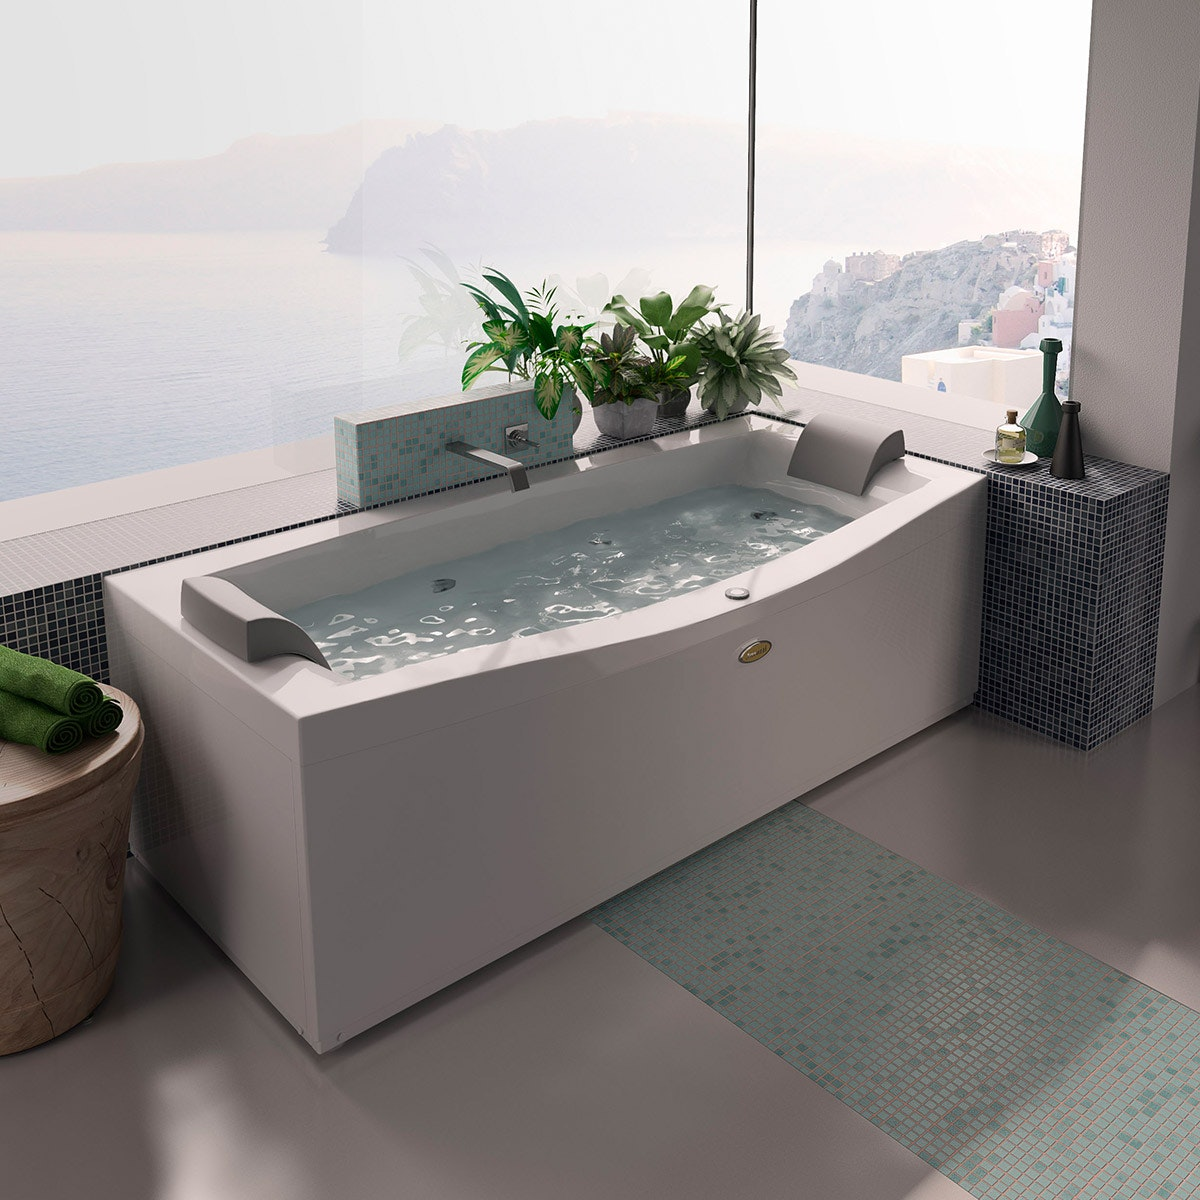 baignoire balnéo rectangulaire : notre top 5 - petite salle de bain